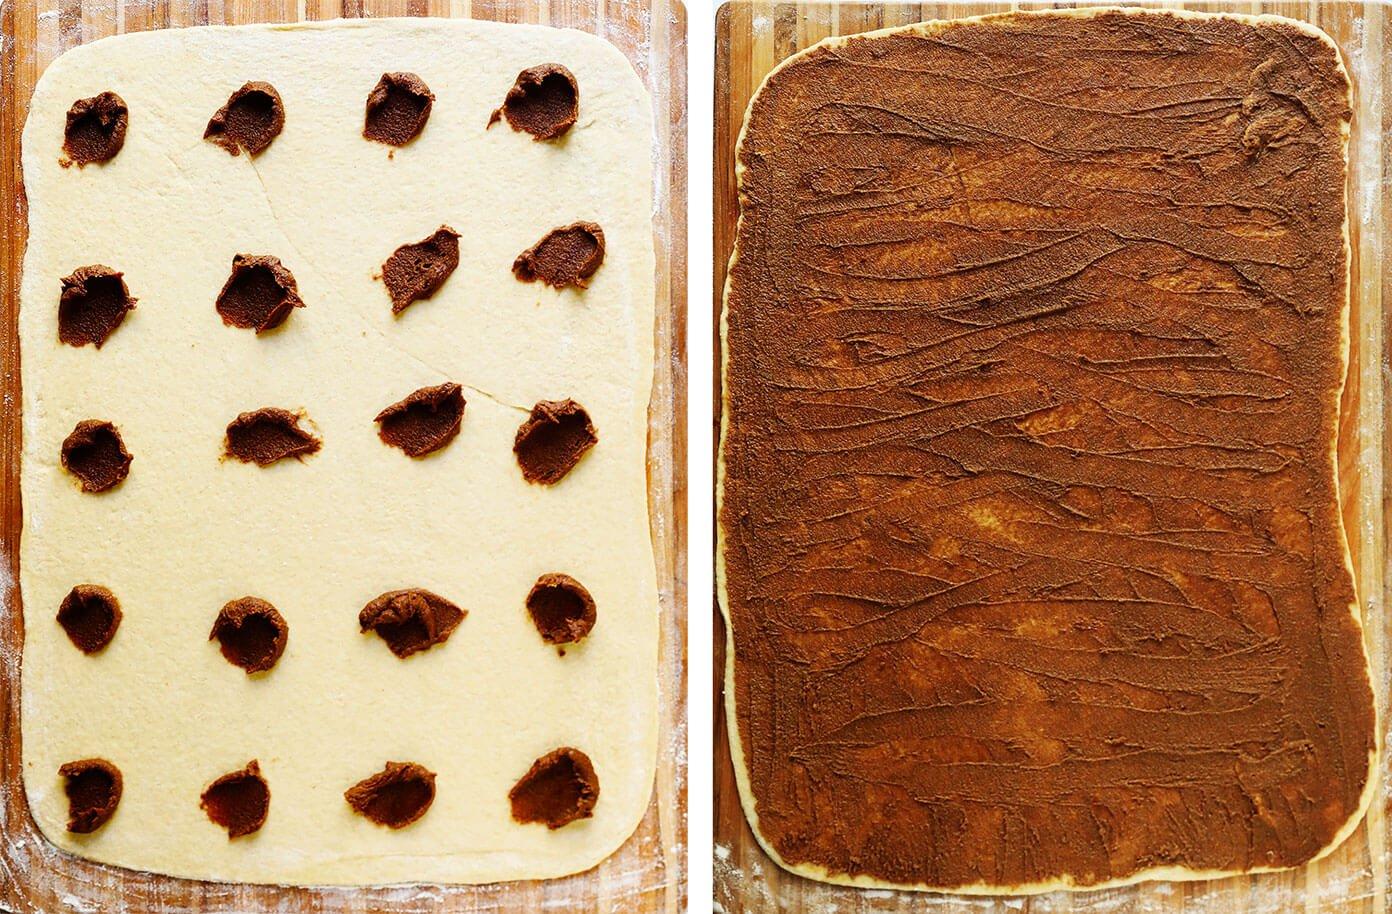 Swedish Cinnamon Bun Filling